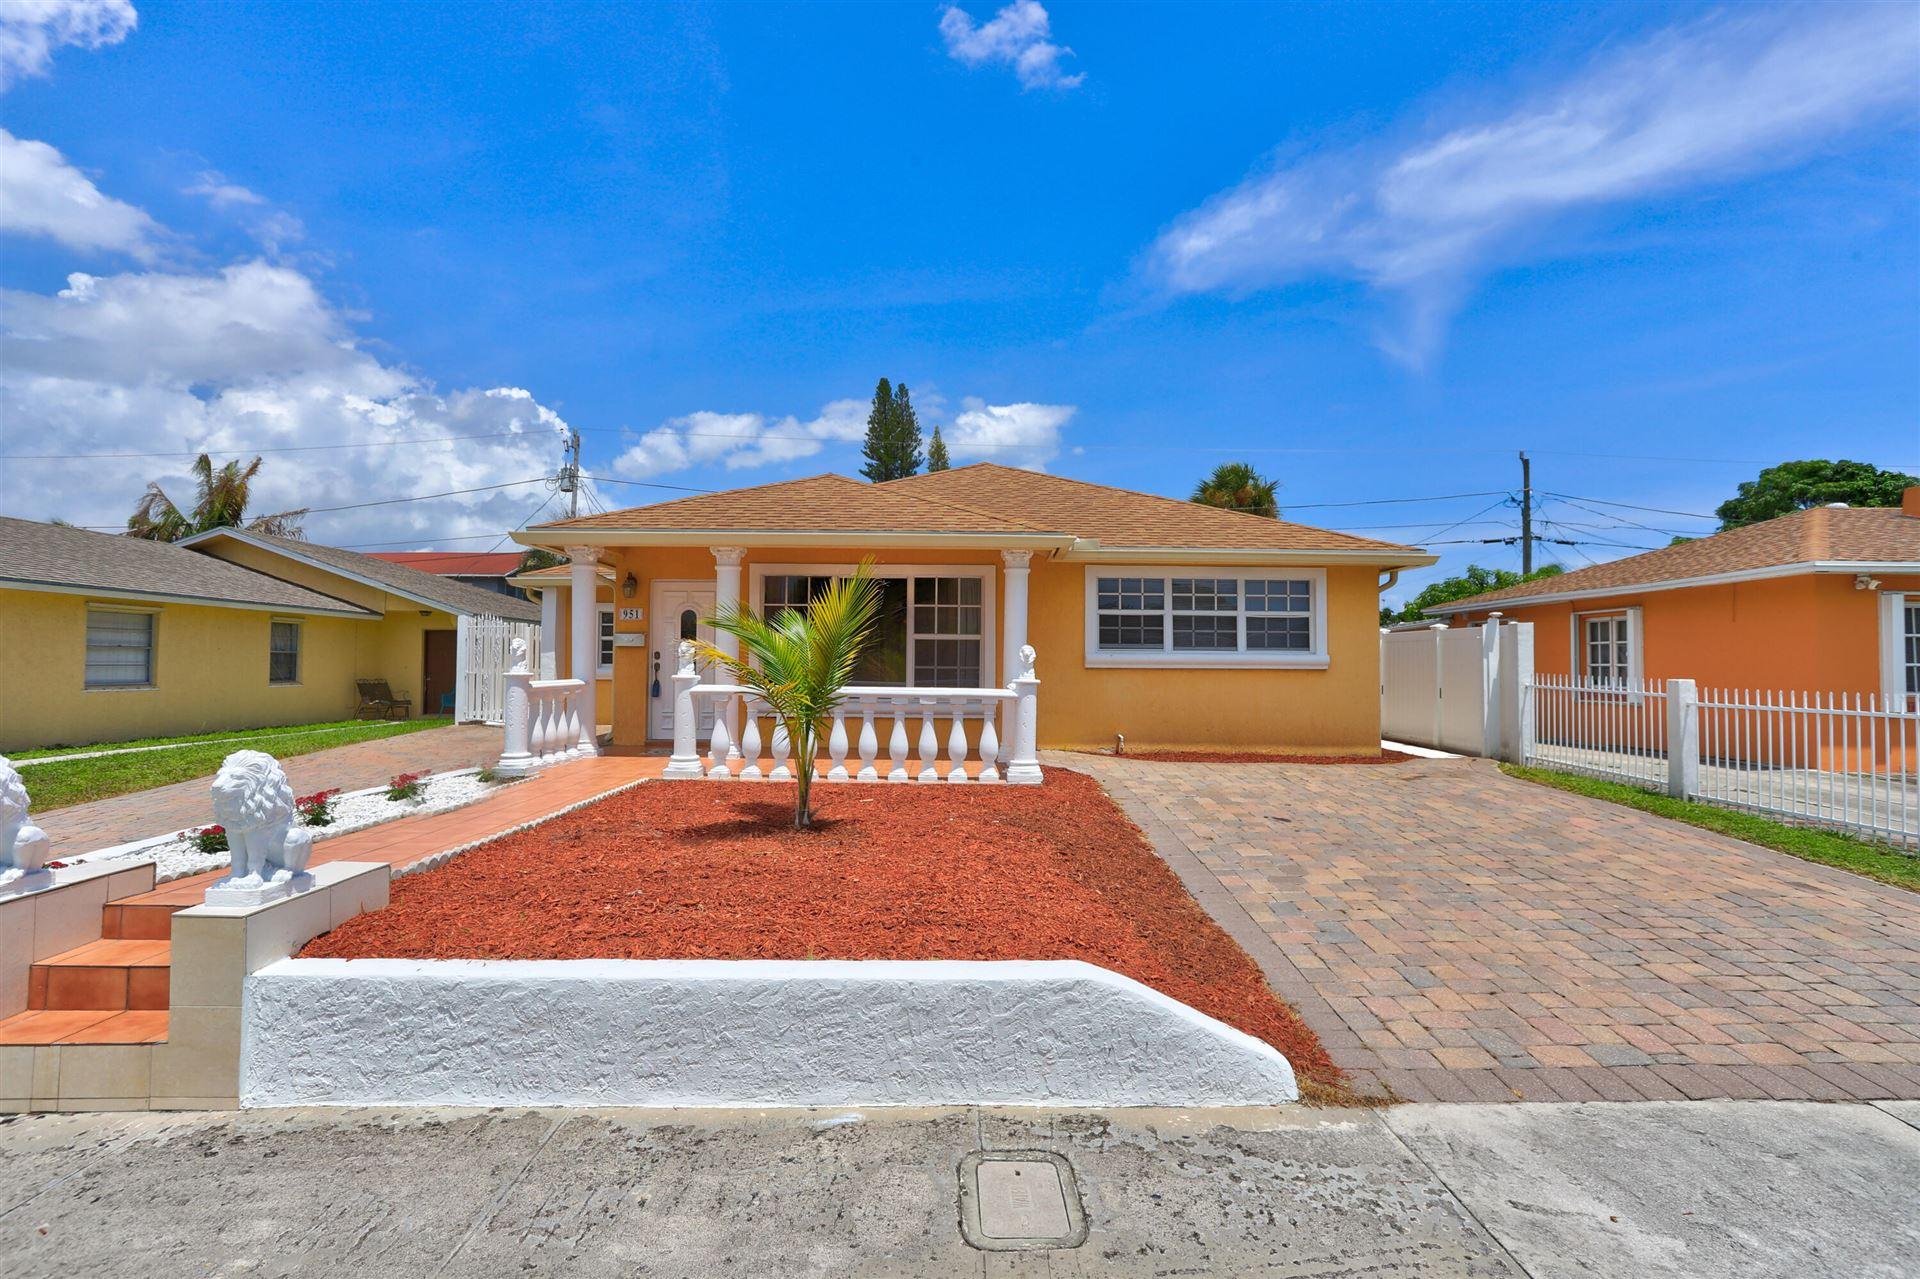 951 Green Street, West Palm Beach, FL 33405 - MLS#: RX-10738985